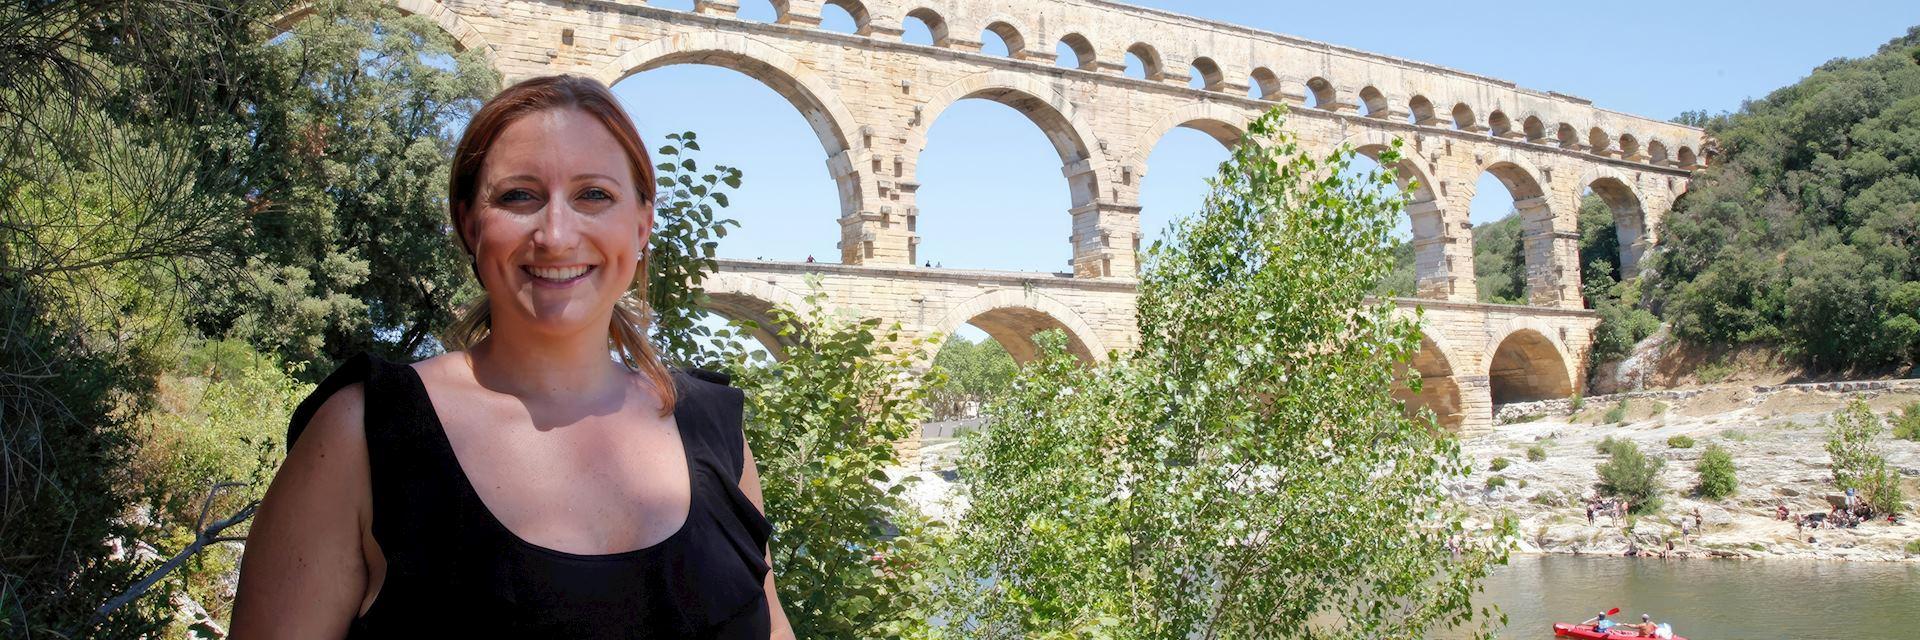 Samantha visiting Pont du Gard, France